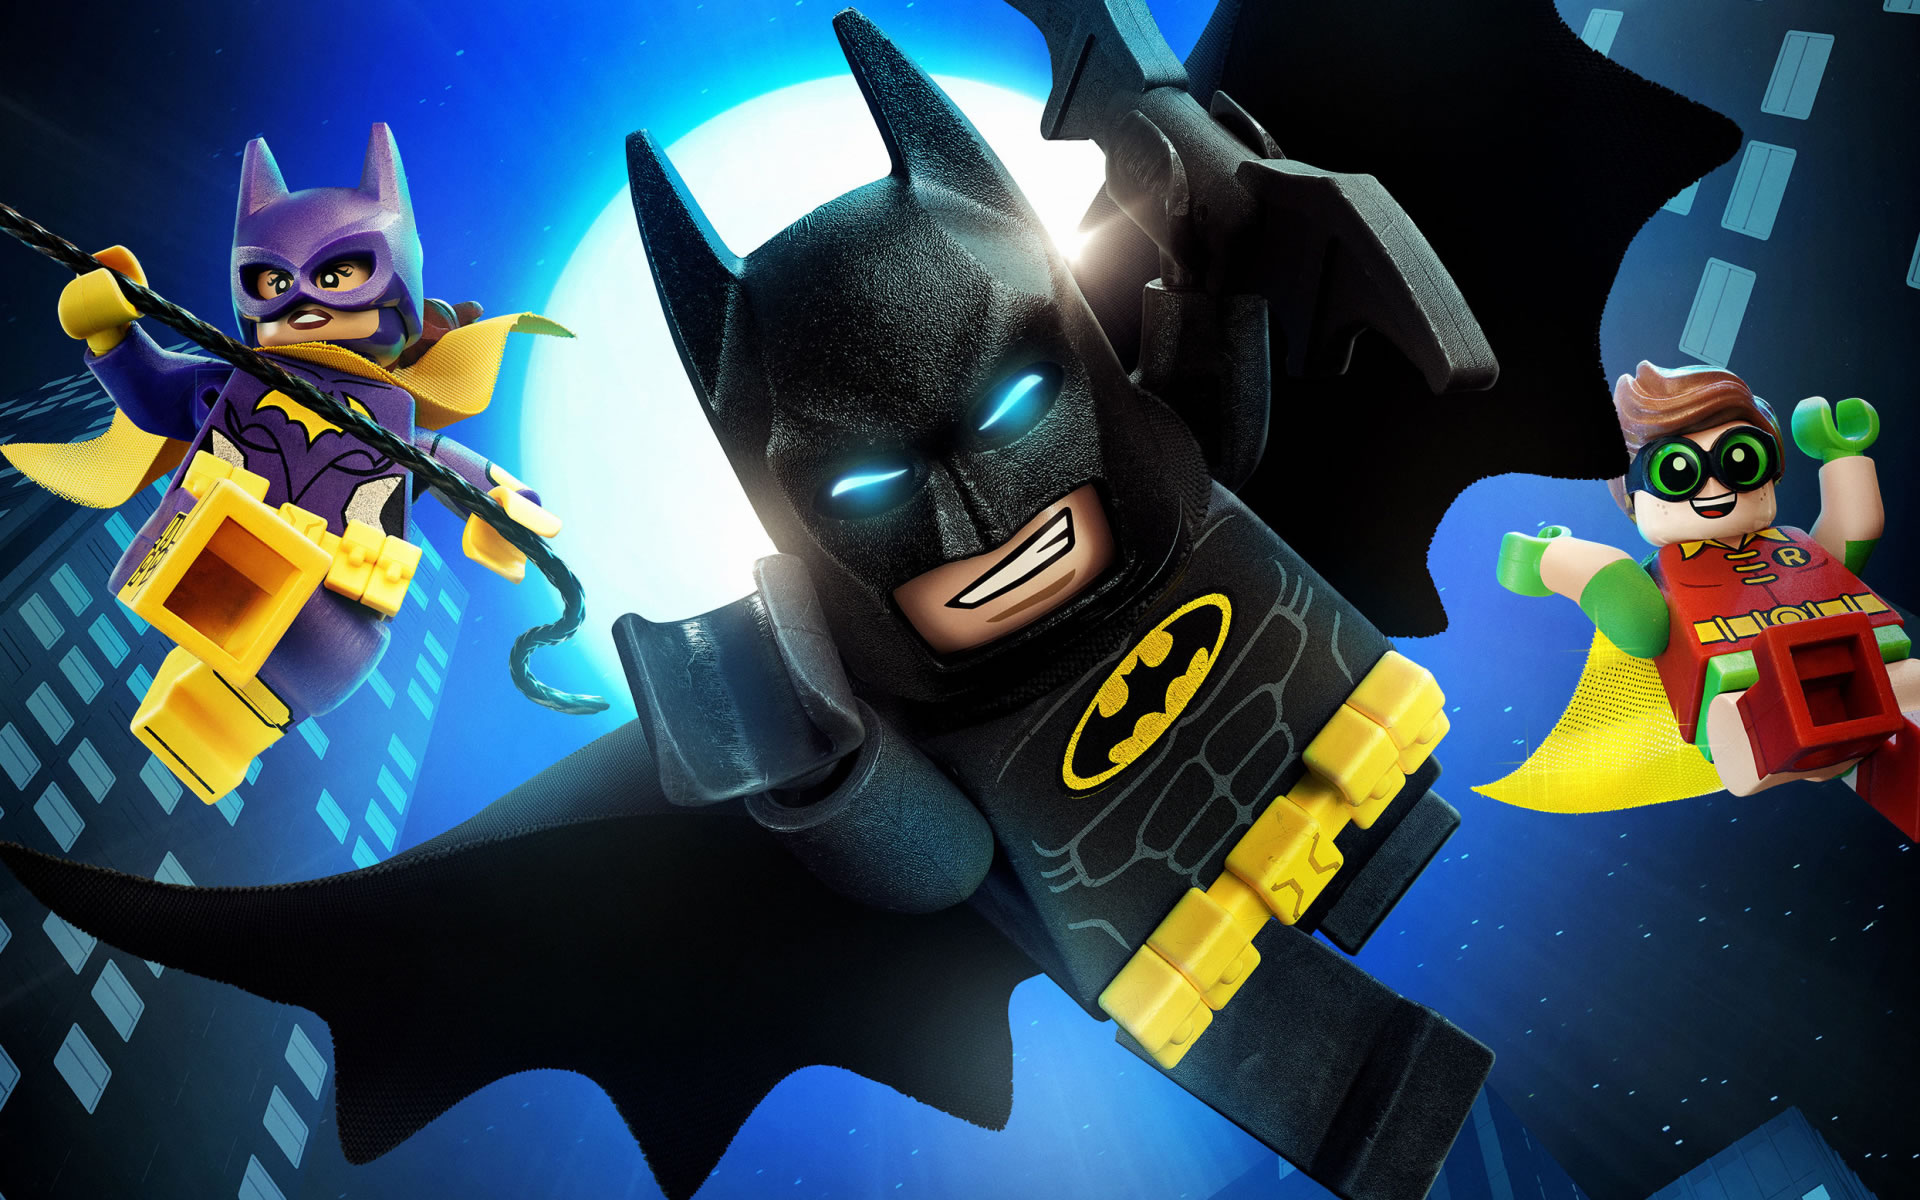 download wallpaper: Lego Batman en Catwoman en Robin wallpaper